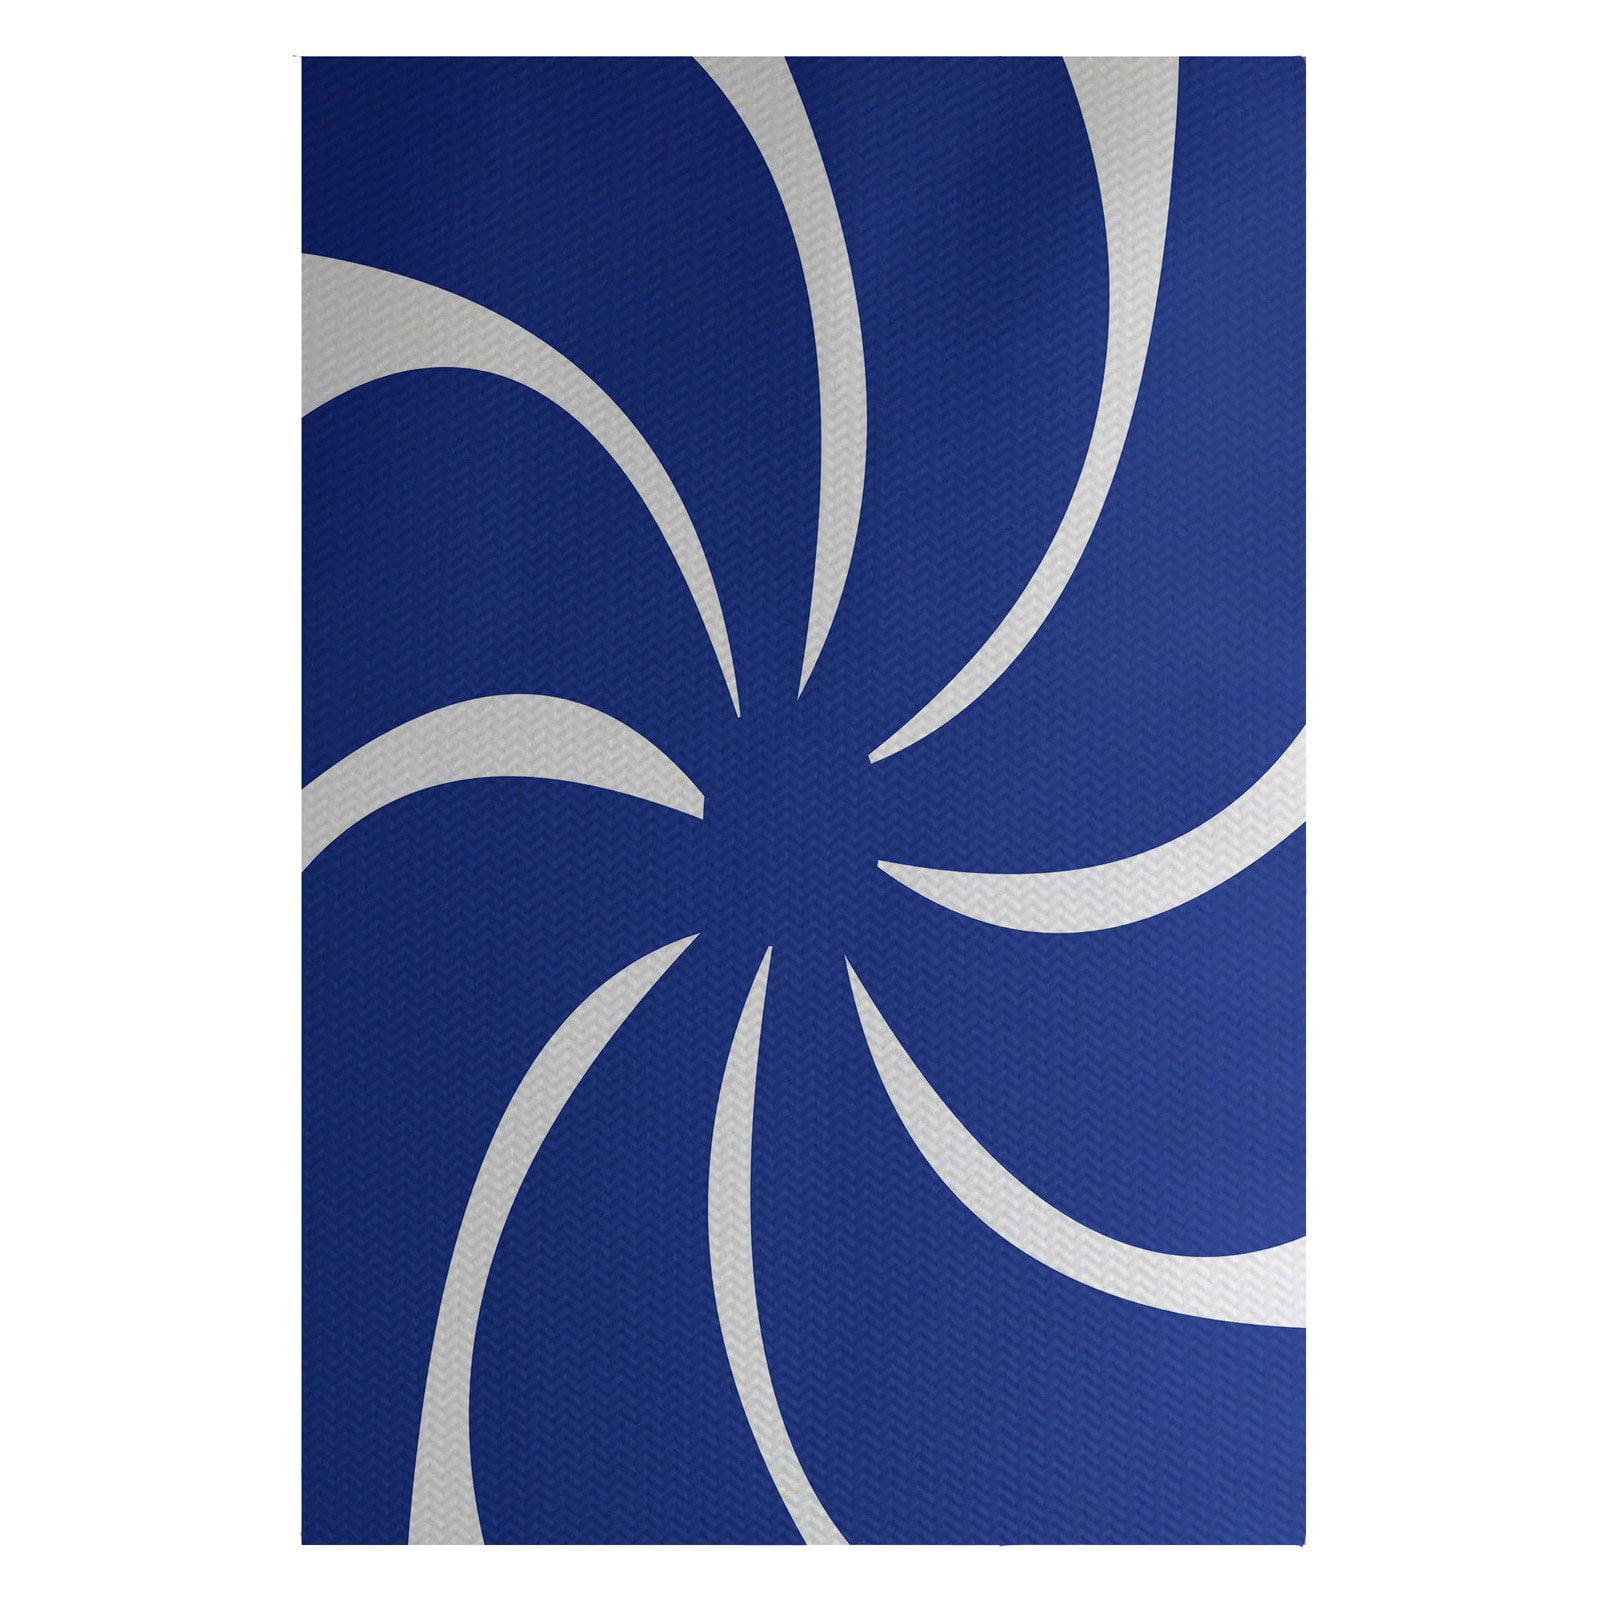 Simply Daisy 3' x 5' Whirl Of The Season Decorative Holiday Geometric Print Indoor Rug